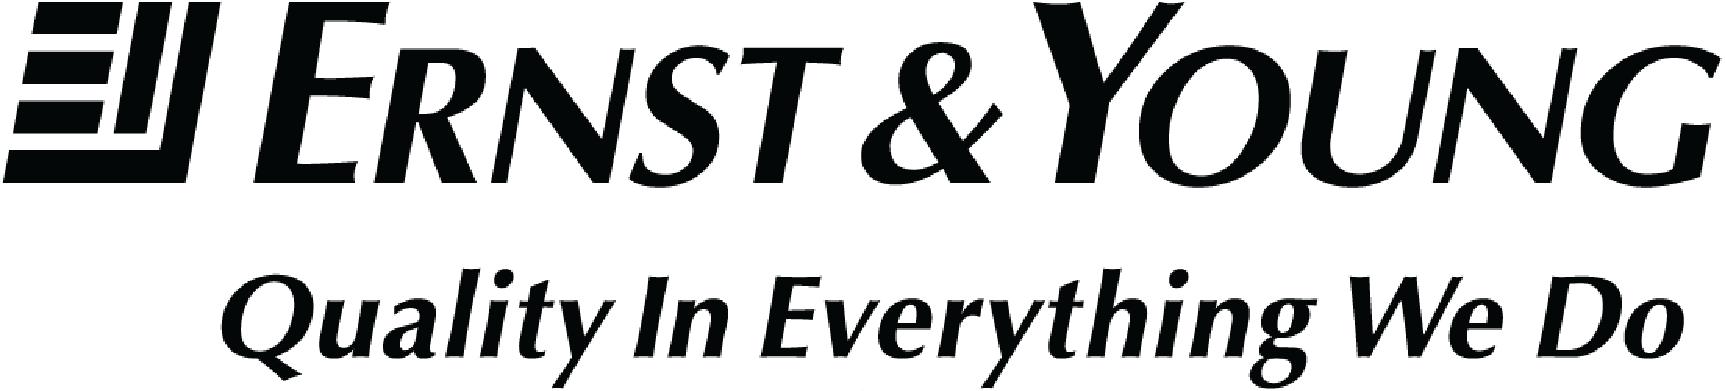 Ernst&Yong